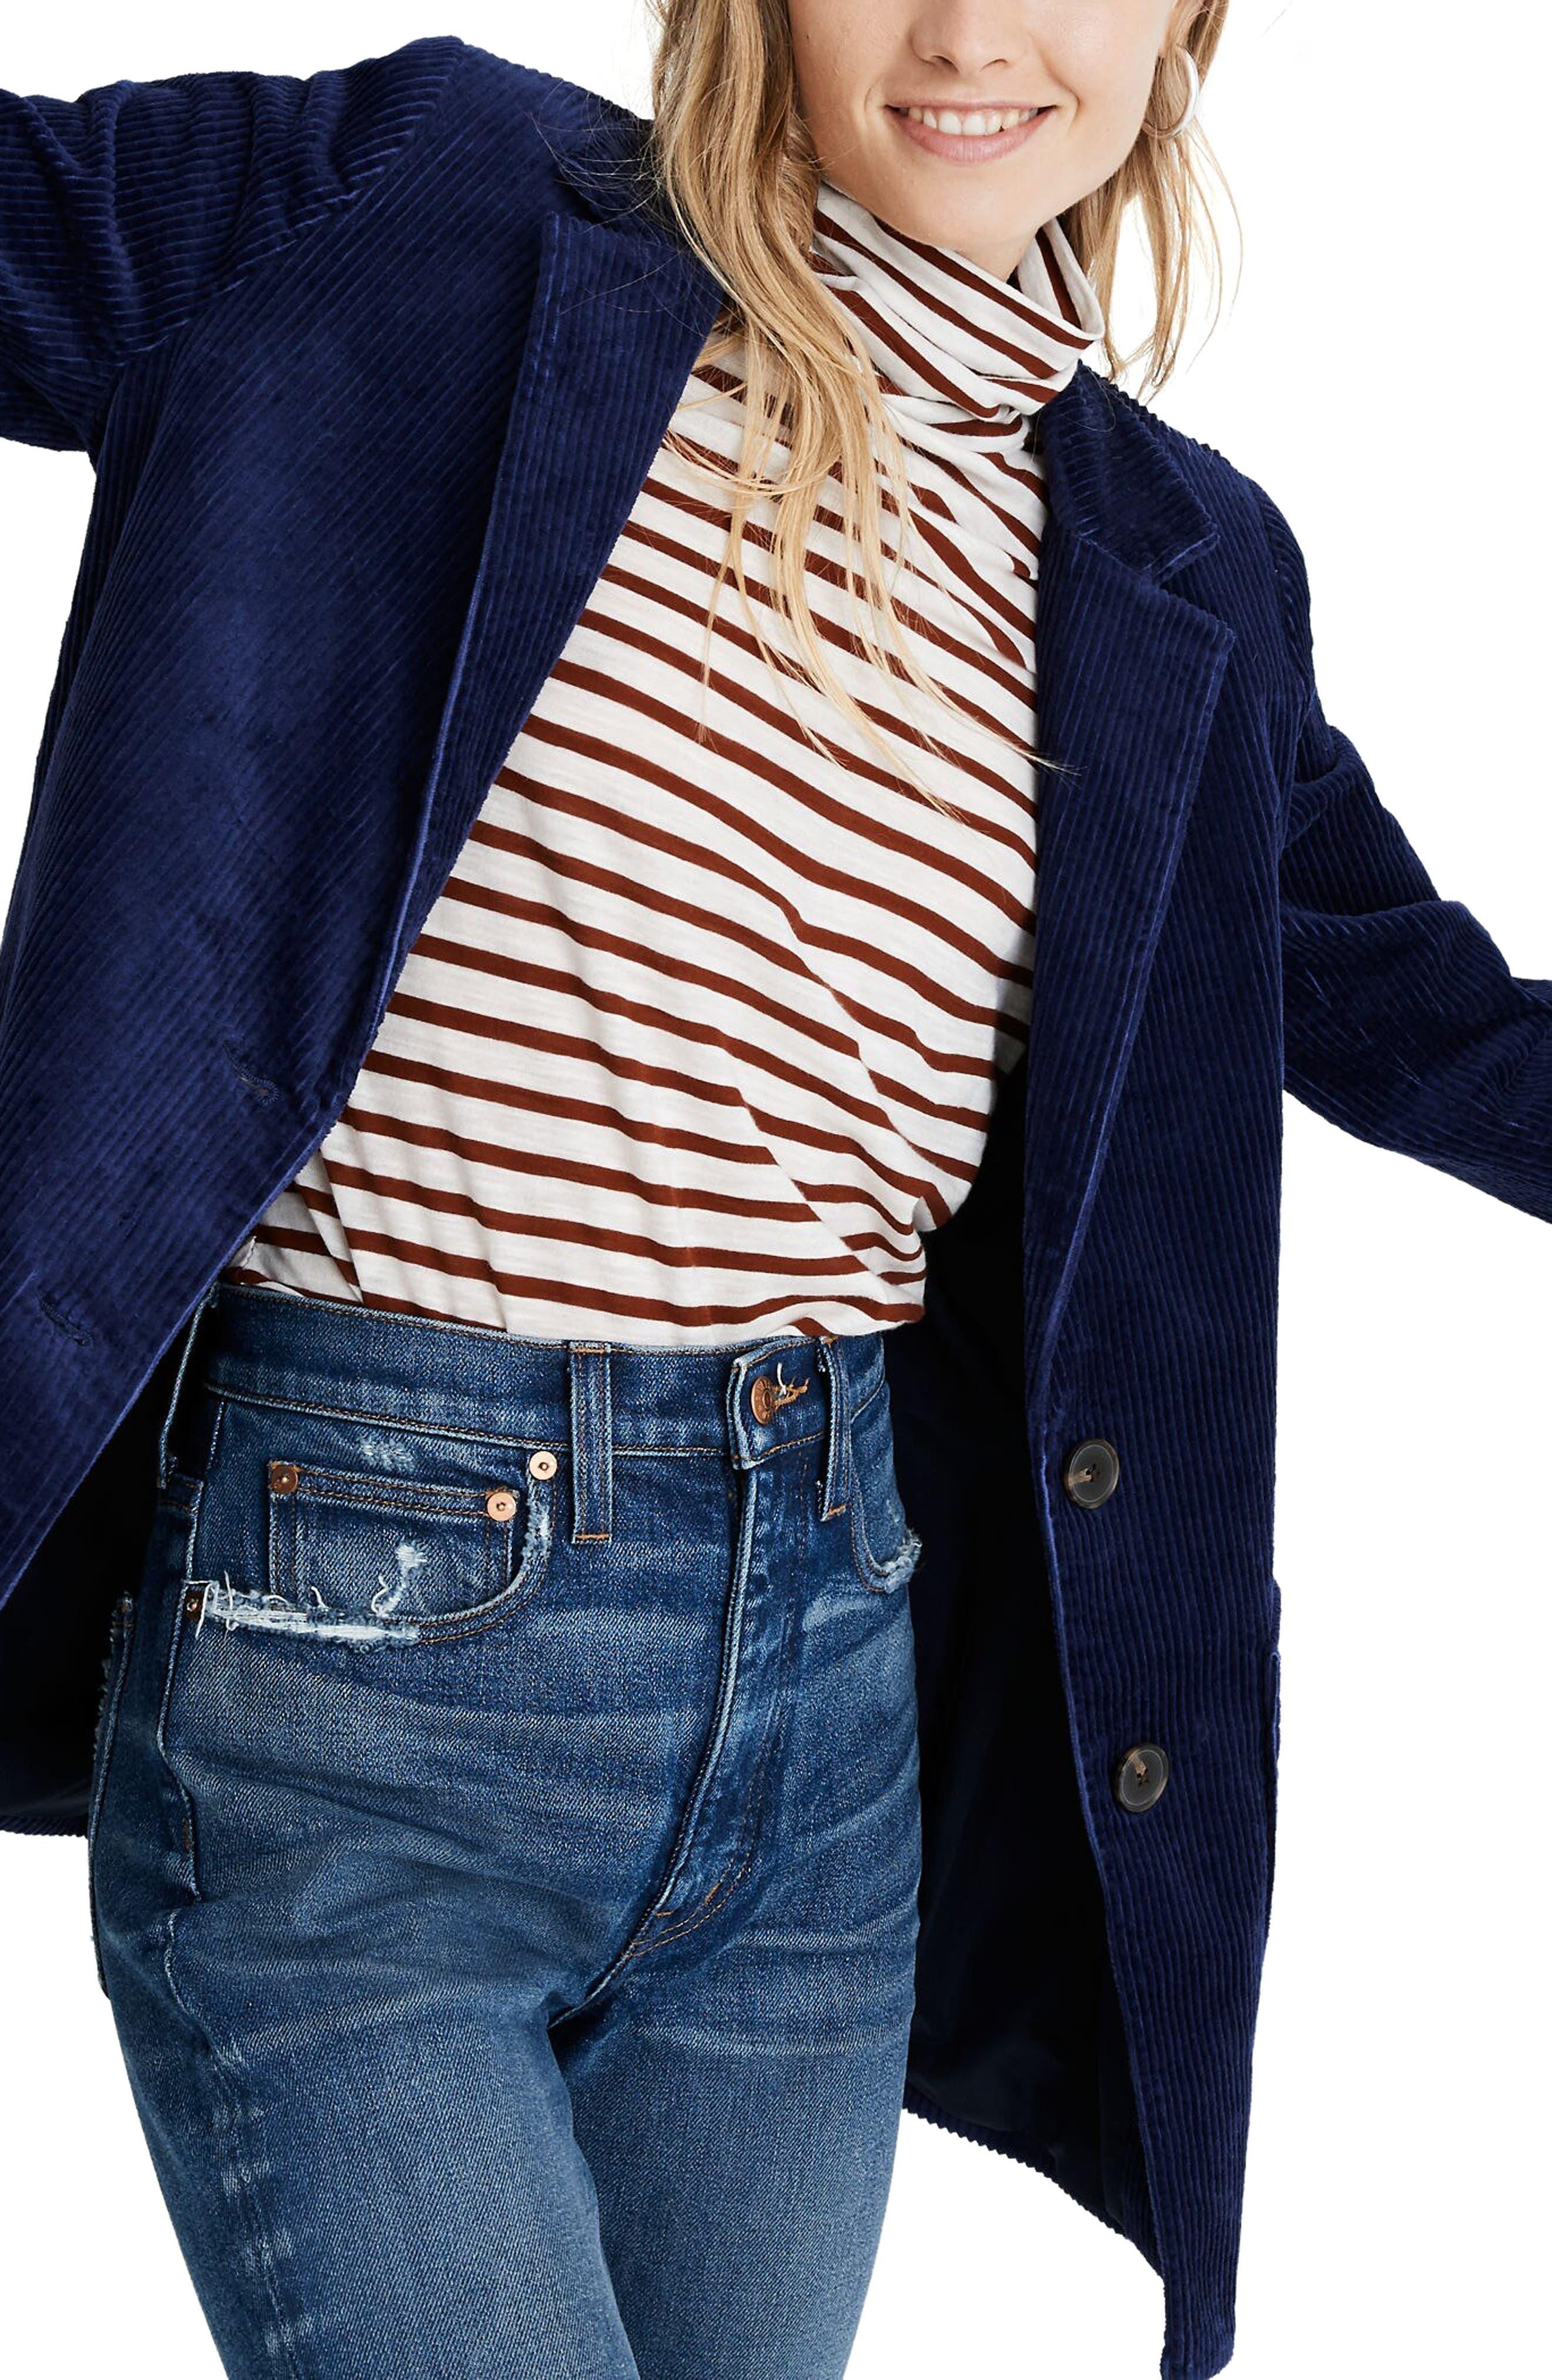 70s Jackets & Hippie Vests, Ponchos Womens Madewell Dorset Corduroy Blazer $178.00 AT vintagedancer.com